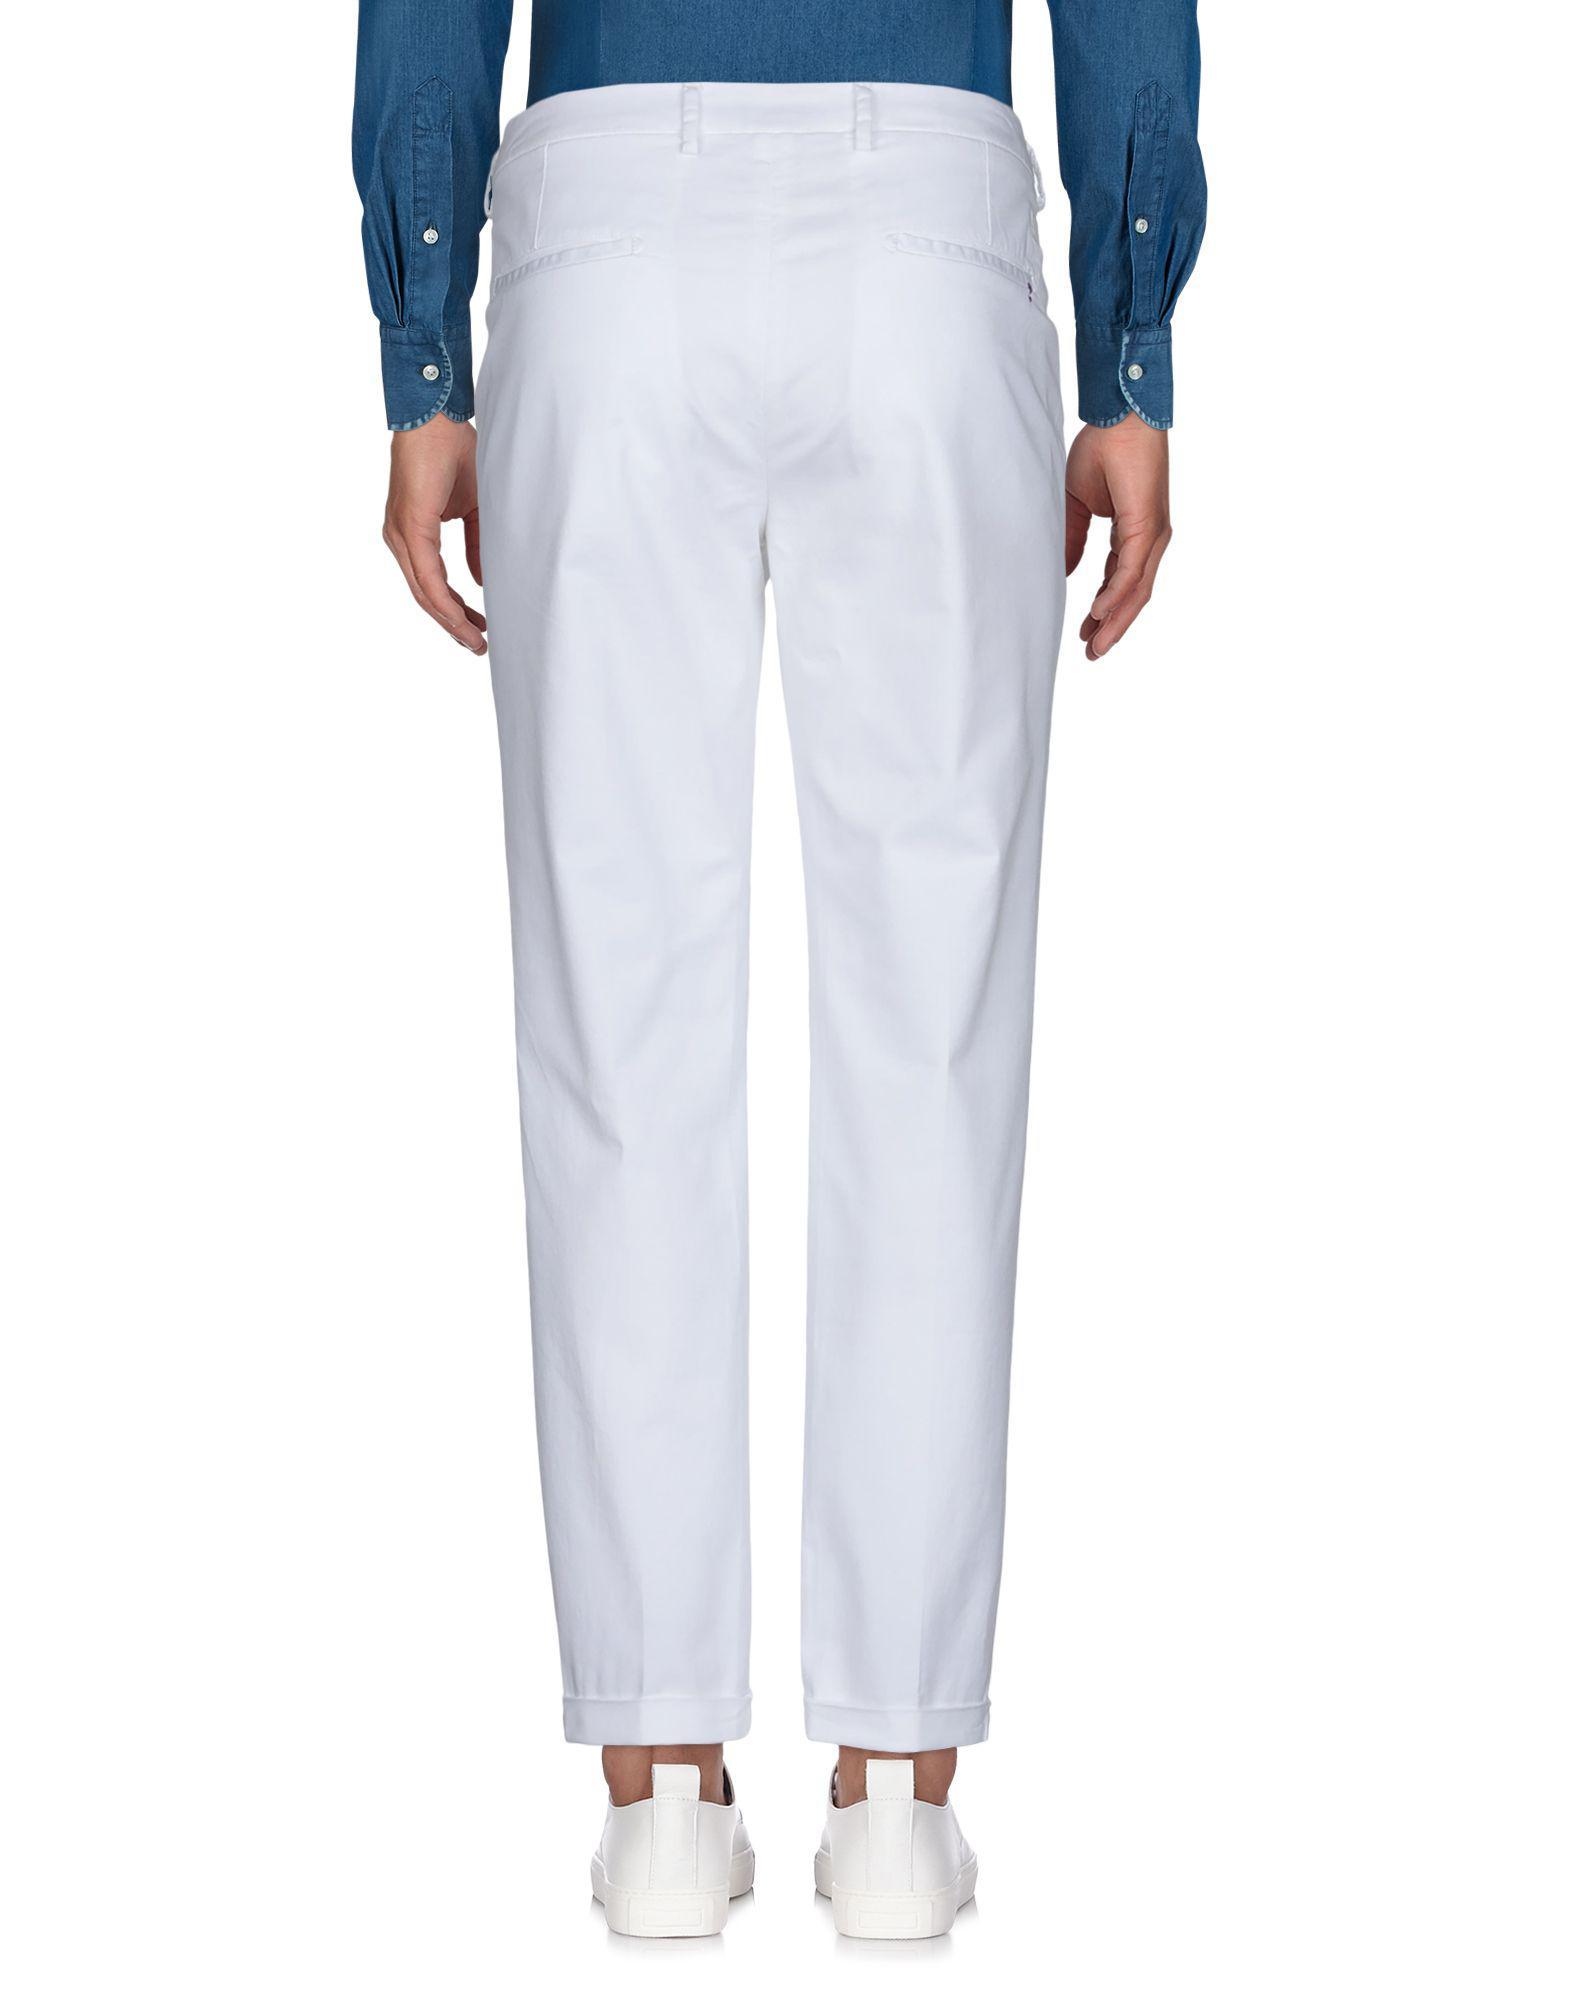 Yan Simmon Cotton Casual Trouser in White for Men